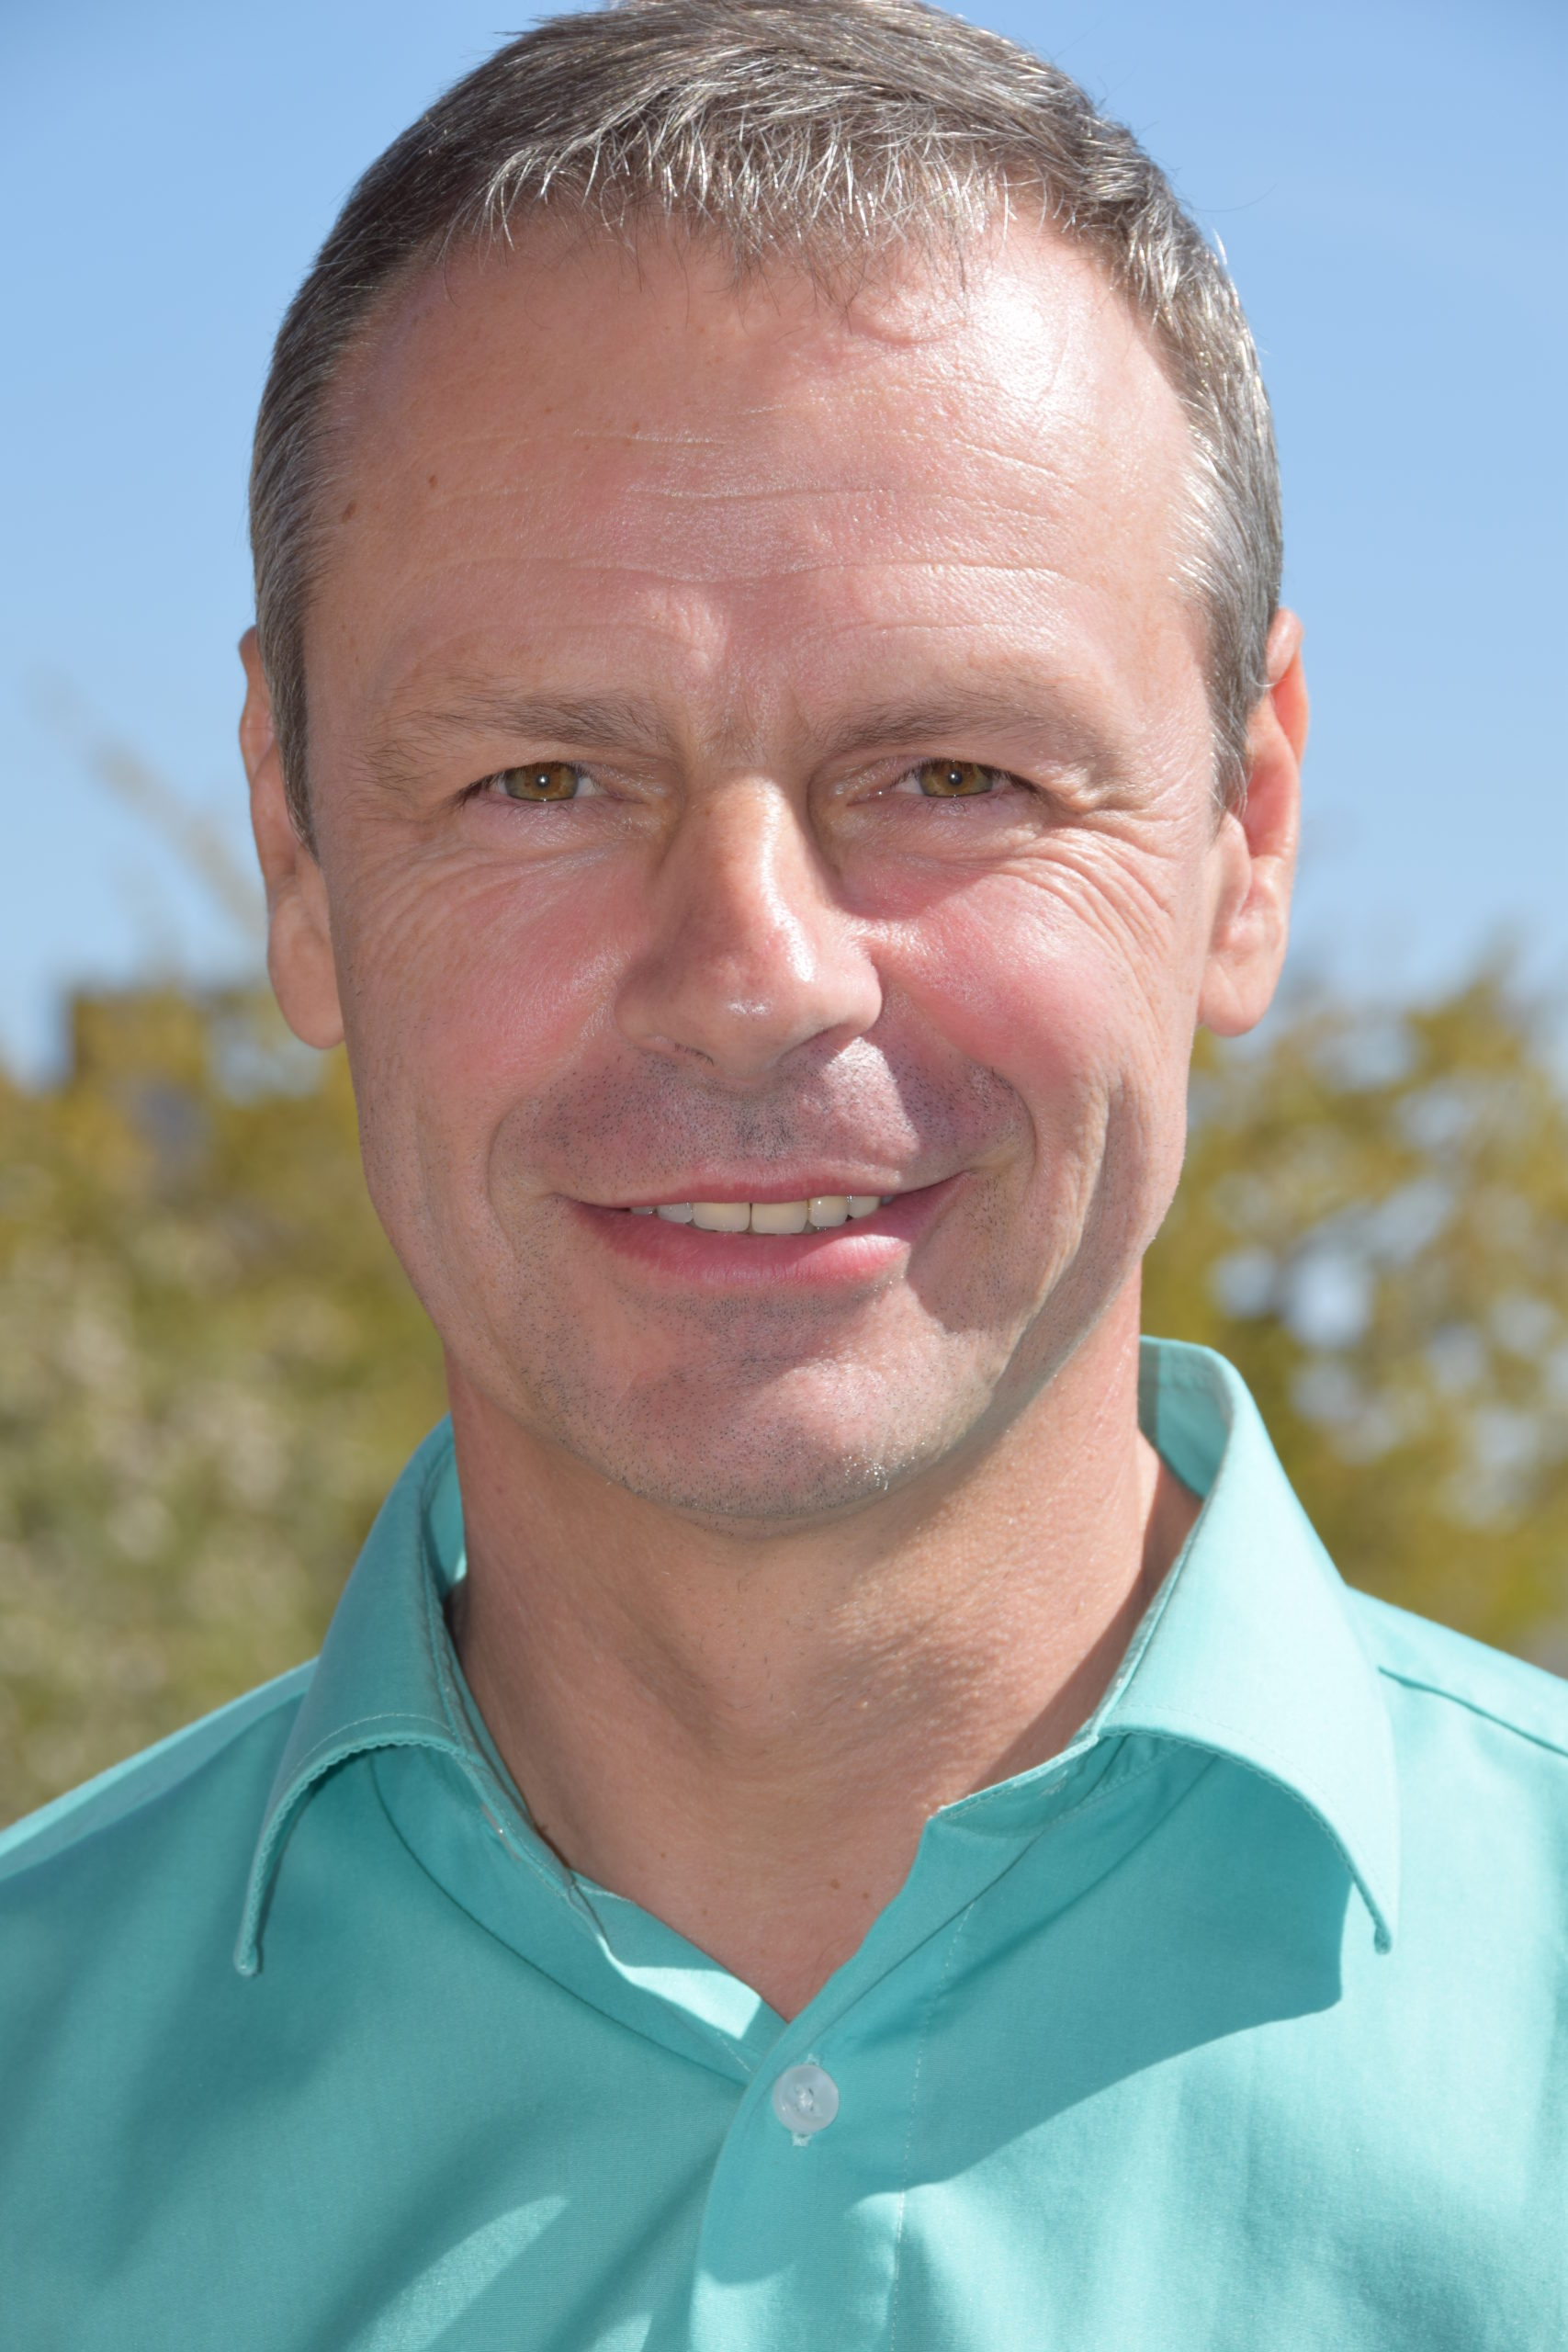 Avatar of Michael Leberle